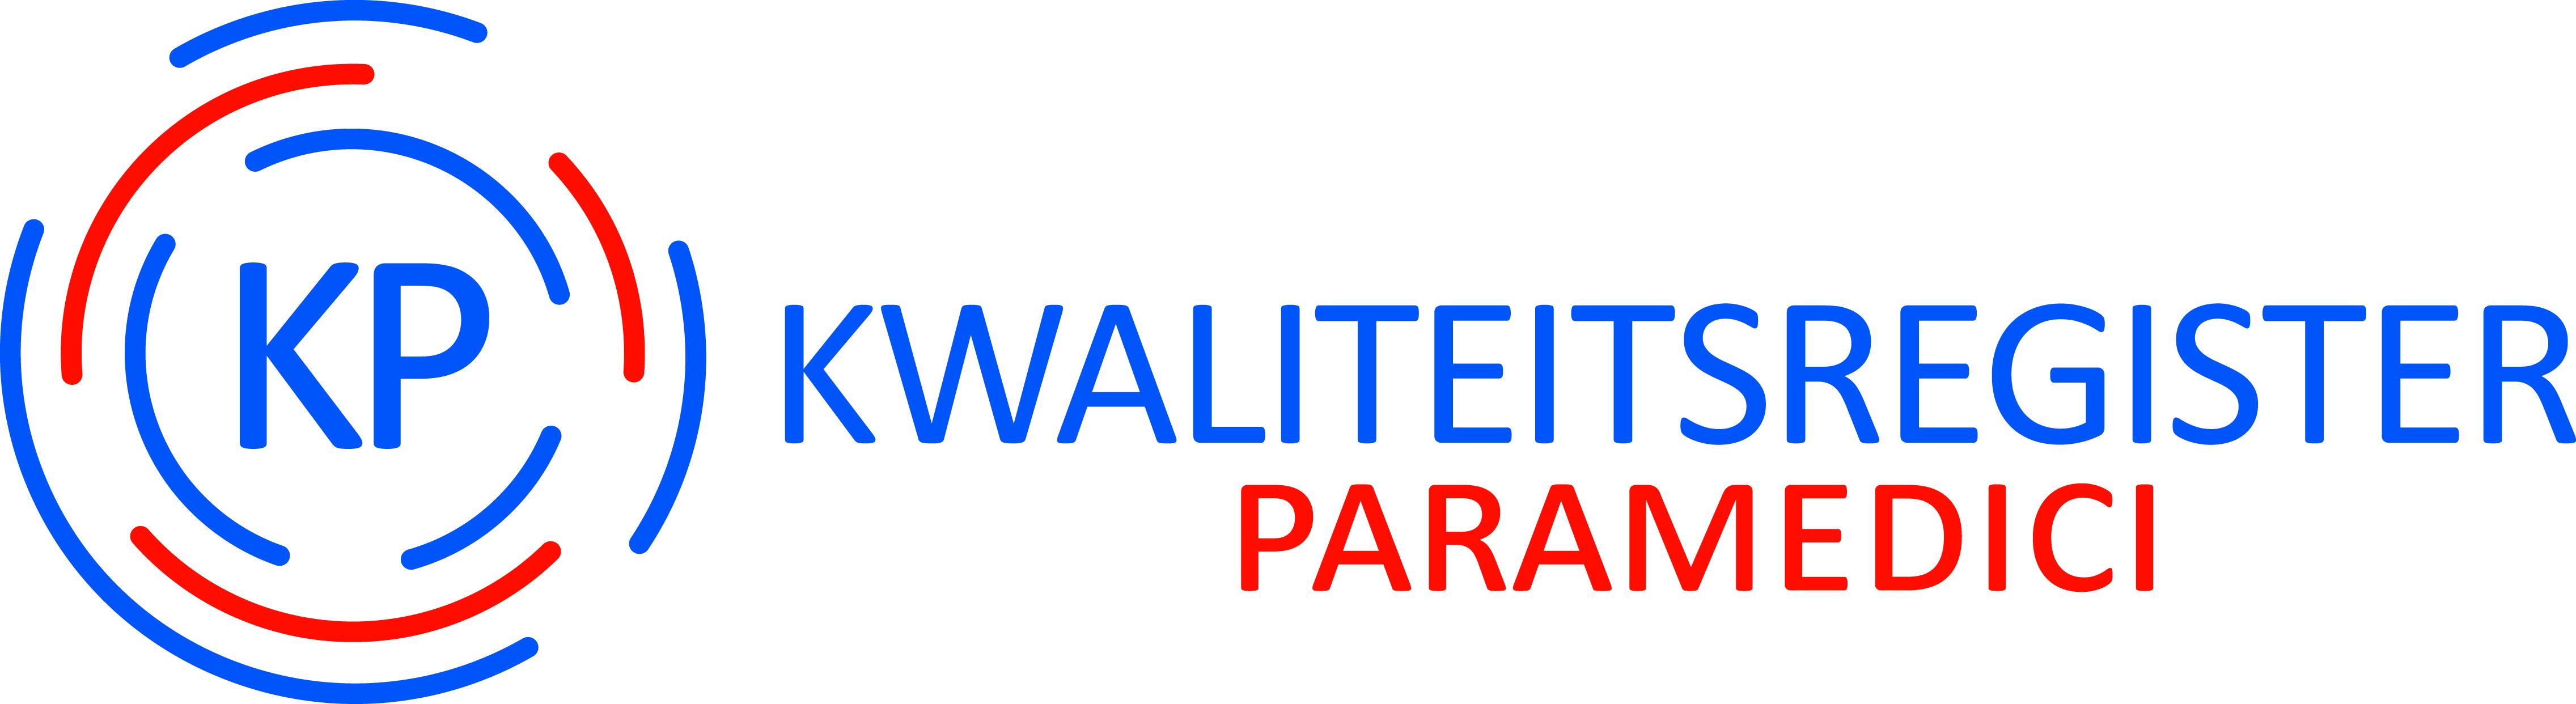 Kwaliteitsregister paramedici | Omniderm